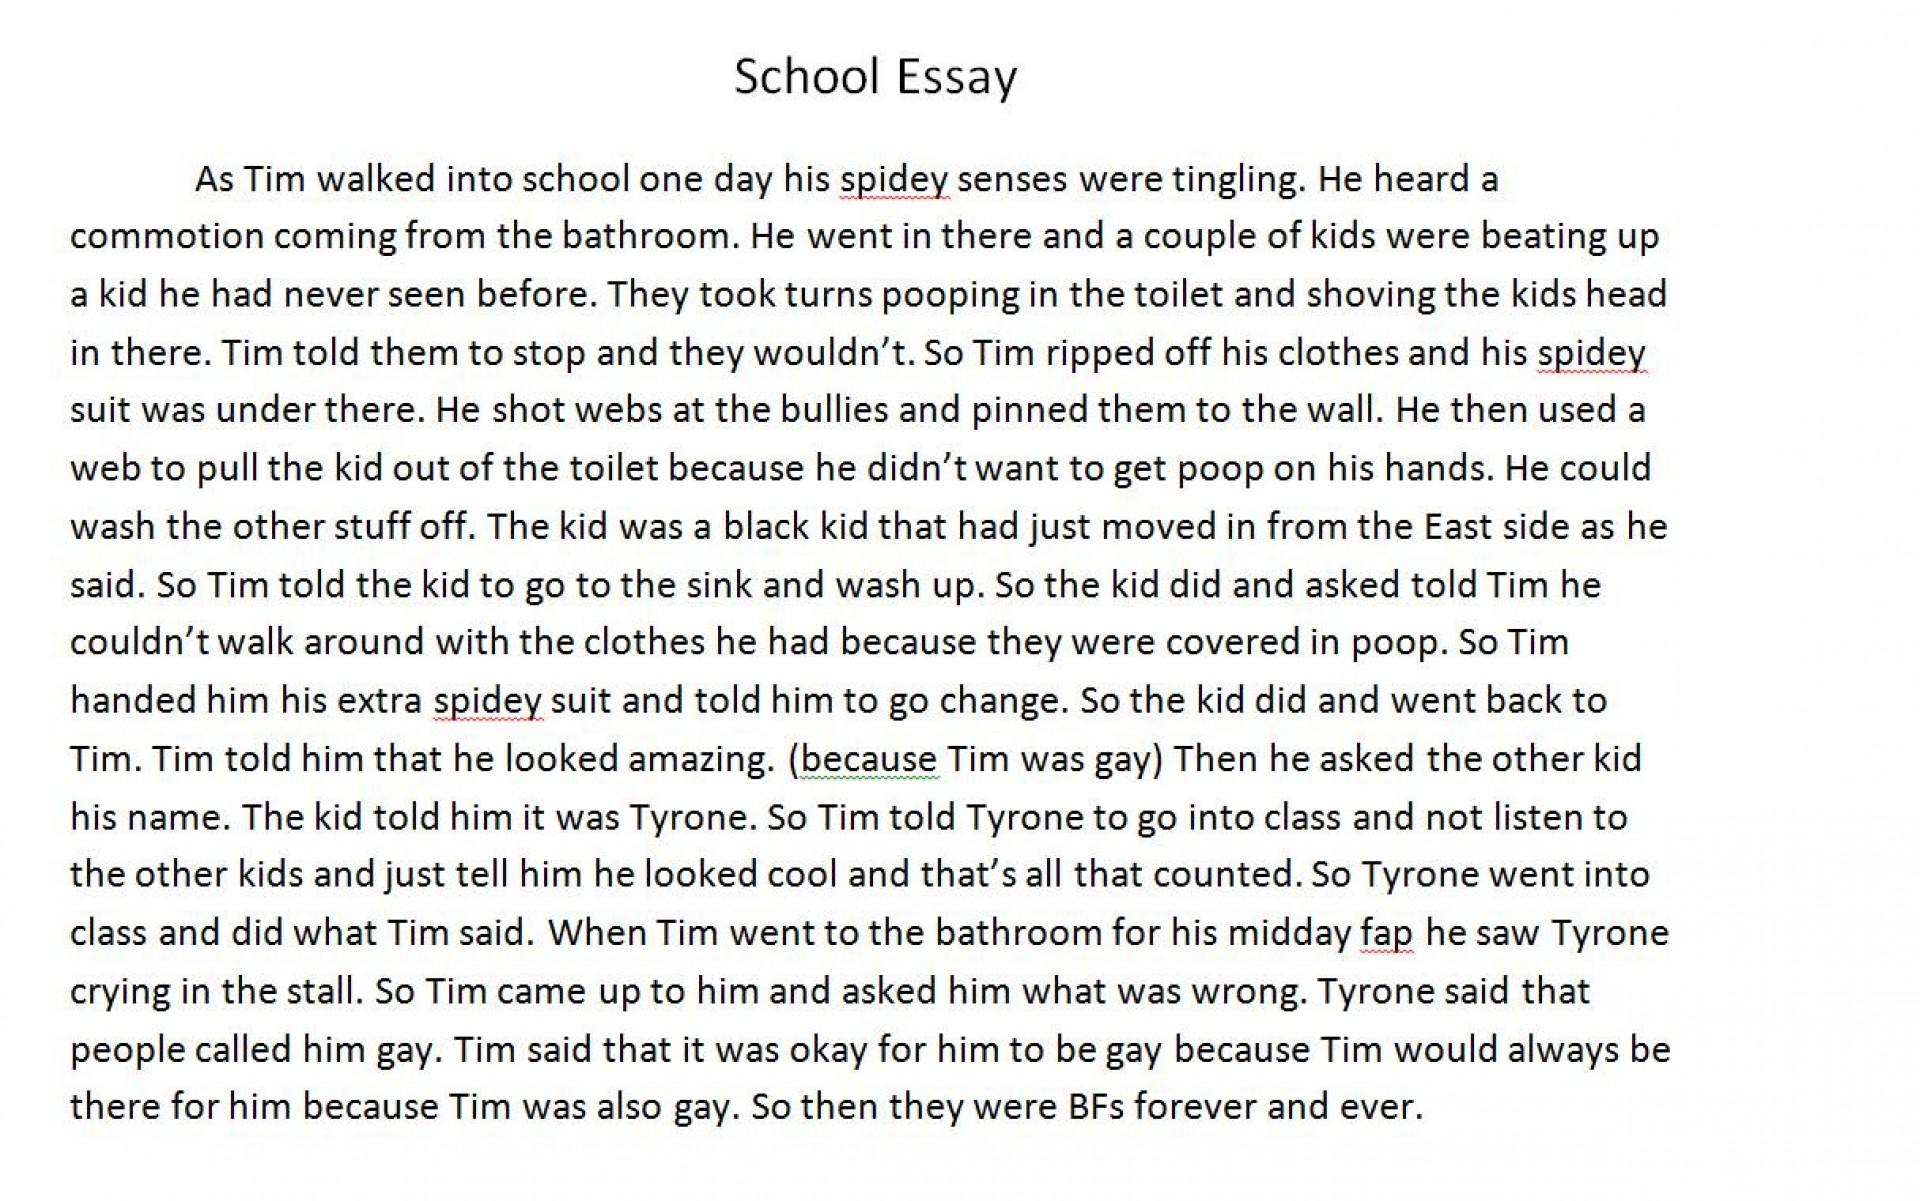 004 Essay Example On School Fddb74 3451752 Excellent Florida Shooting Uniform Is Necessary 1920